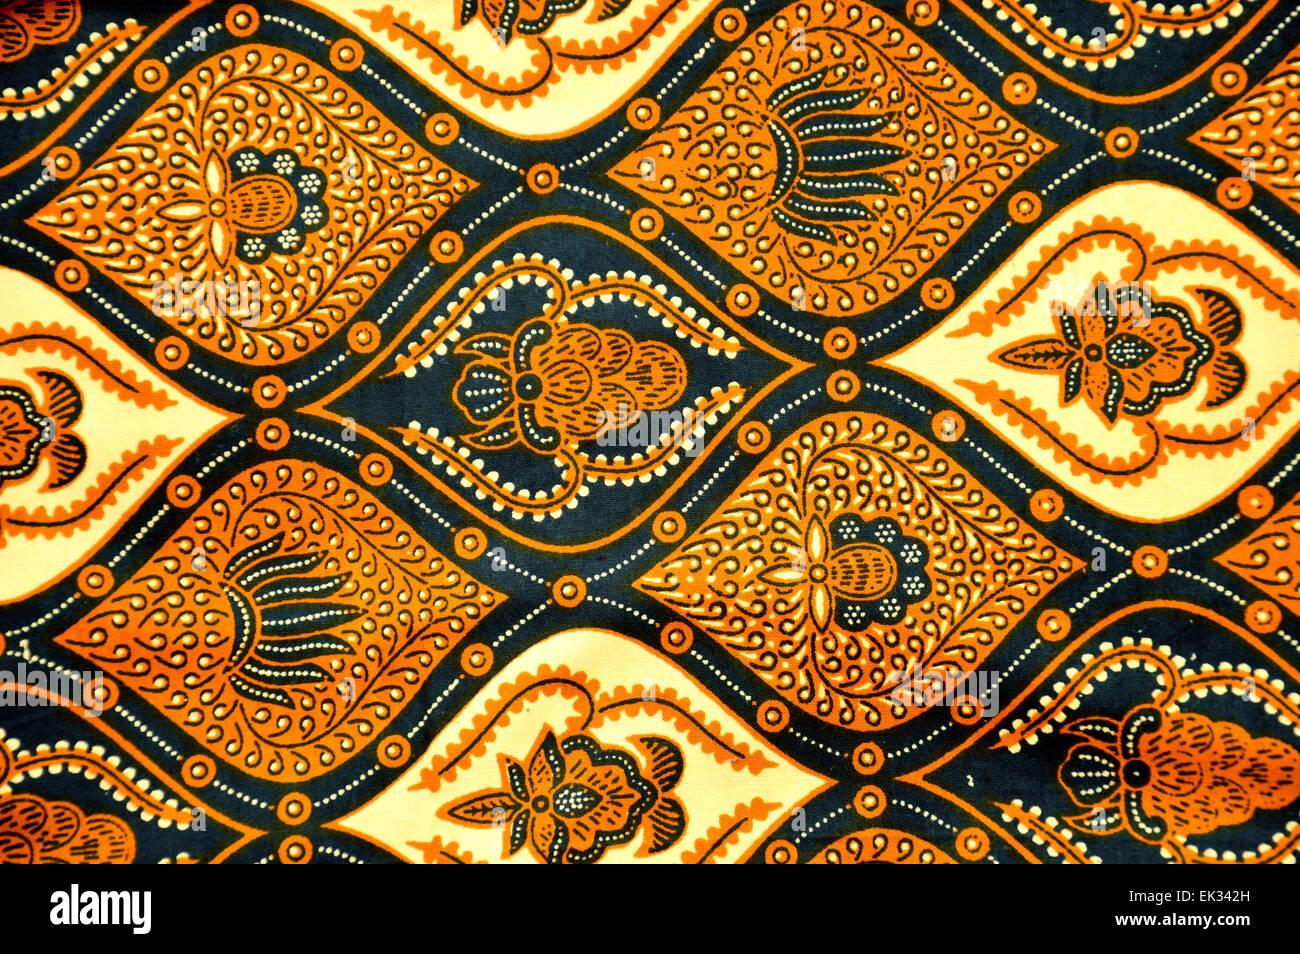 Indonesian Batik Patterns Stock Photos  Indonesian Batik